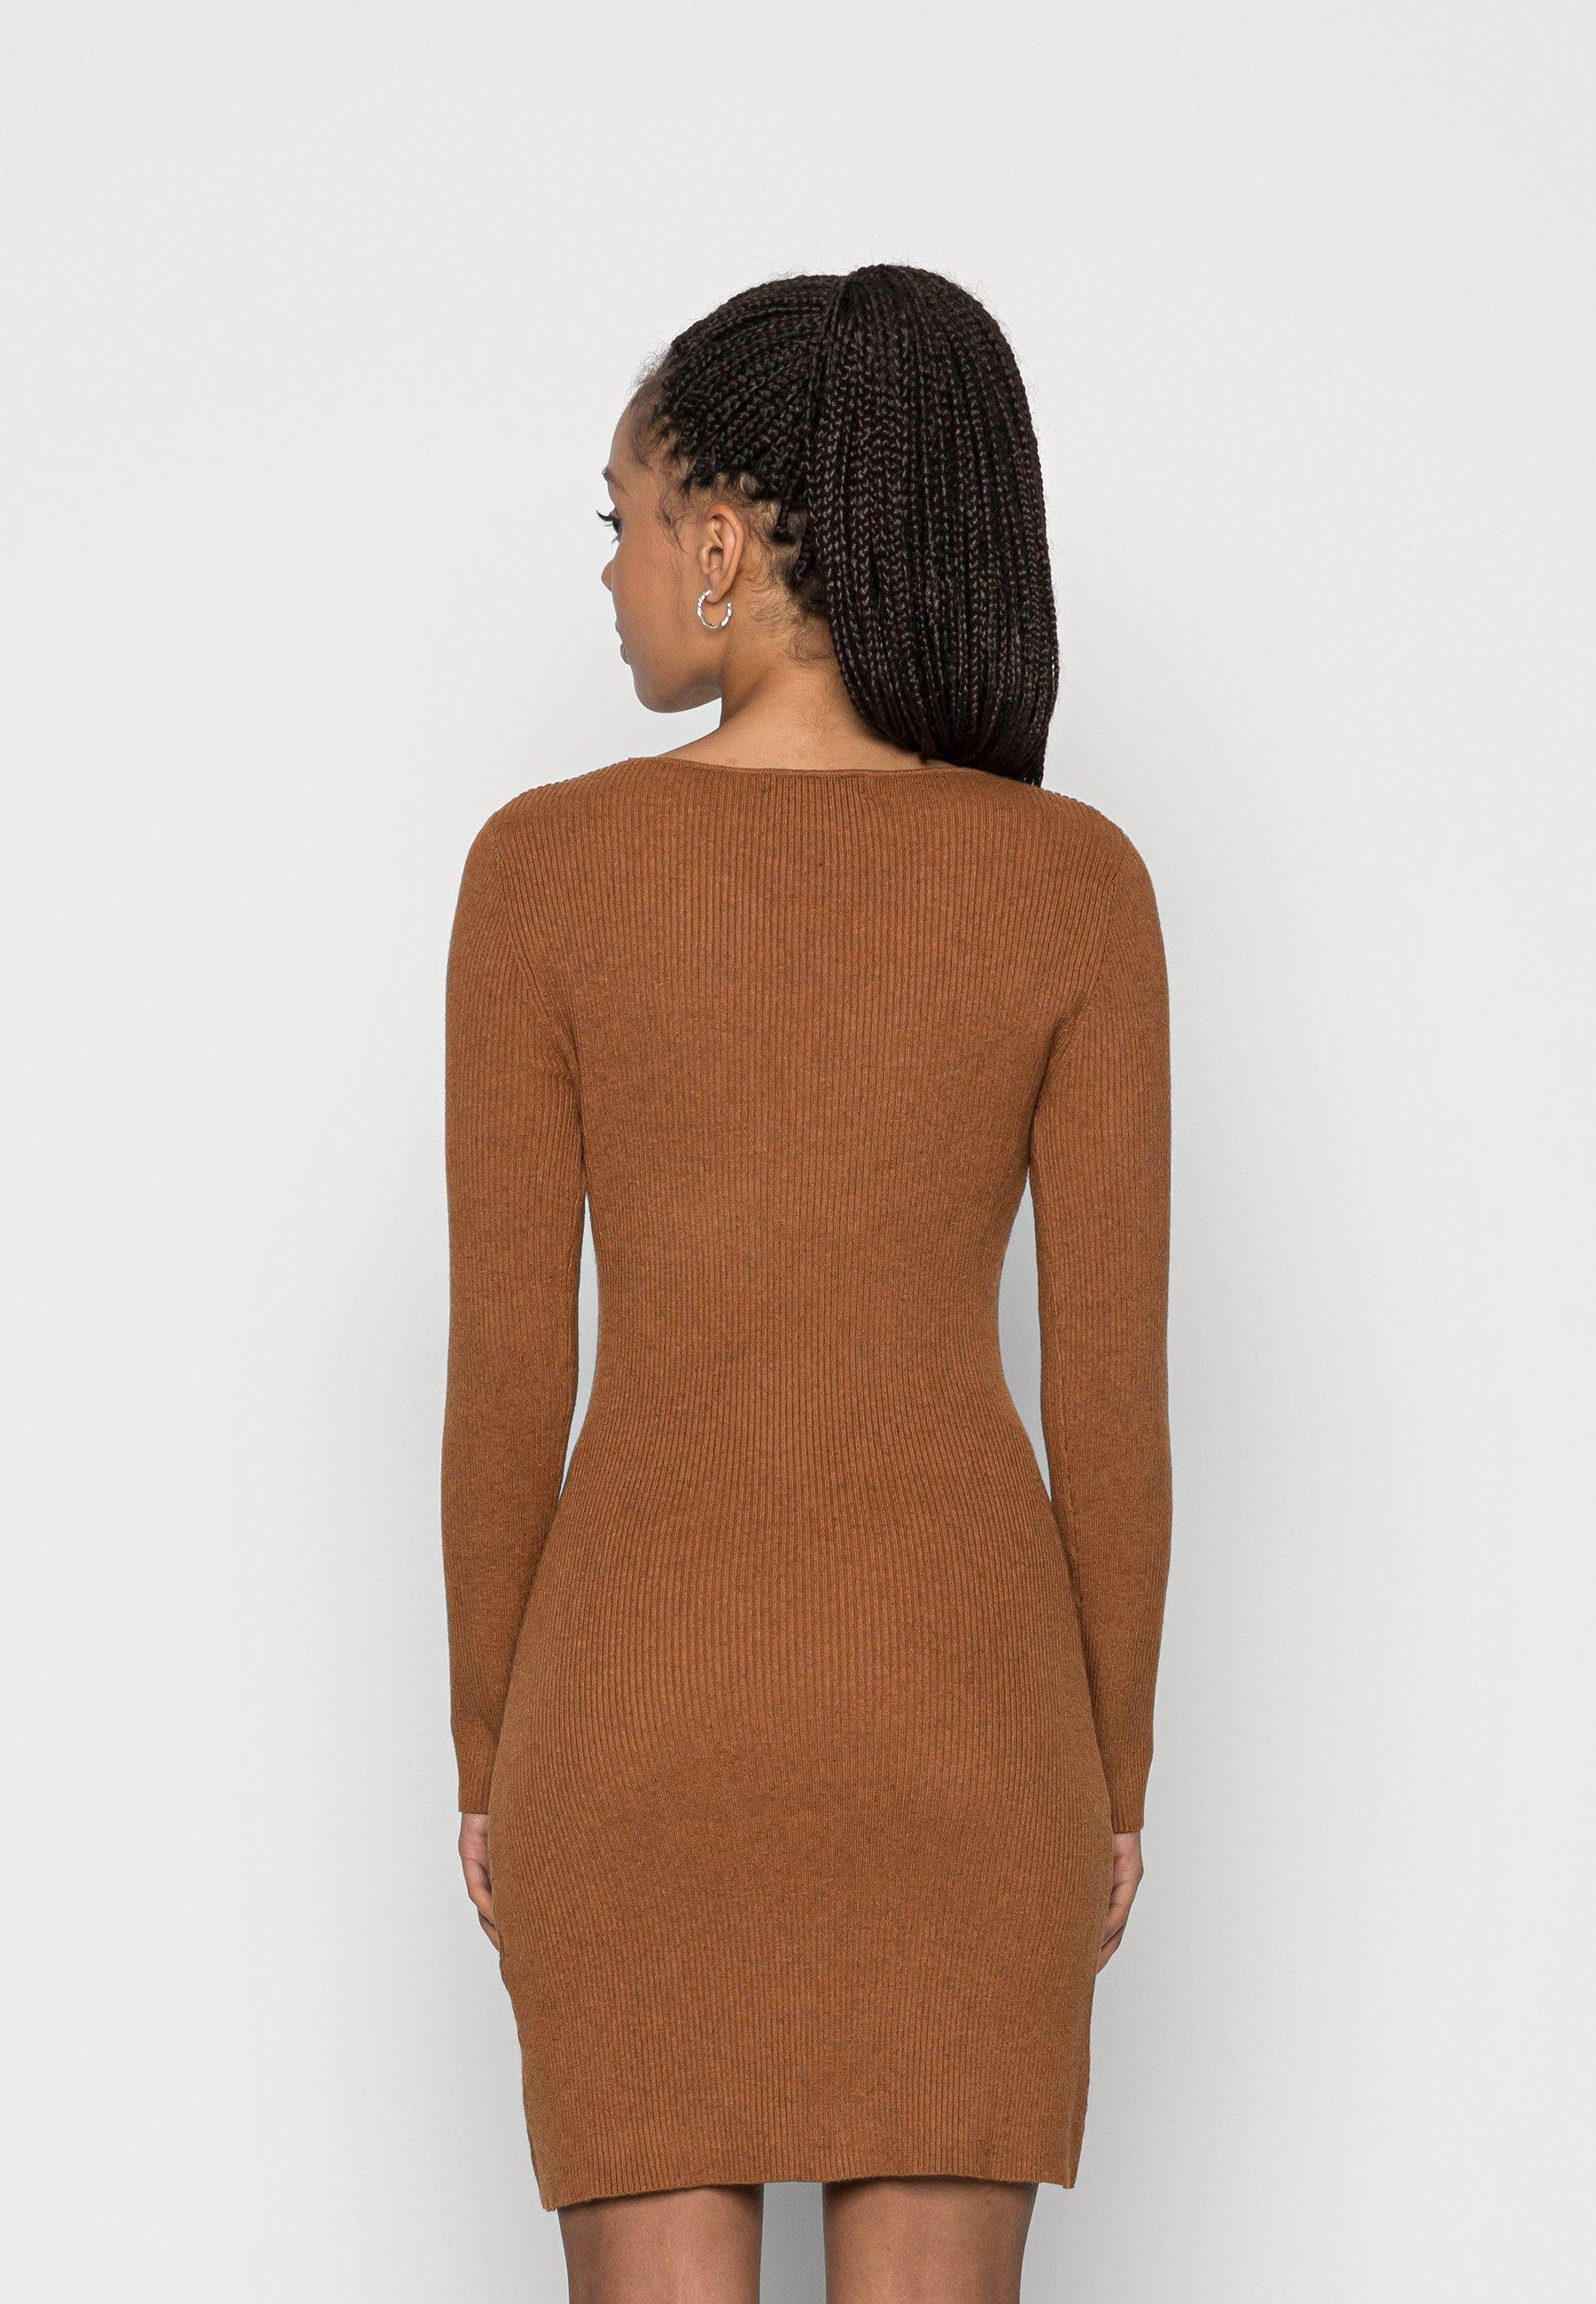 Donna OBERLIN GATHERED DETAIL DRESS - Abito in maglia